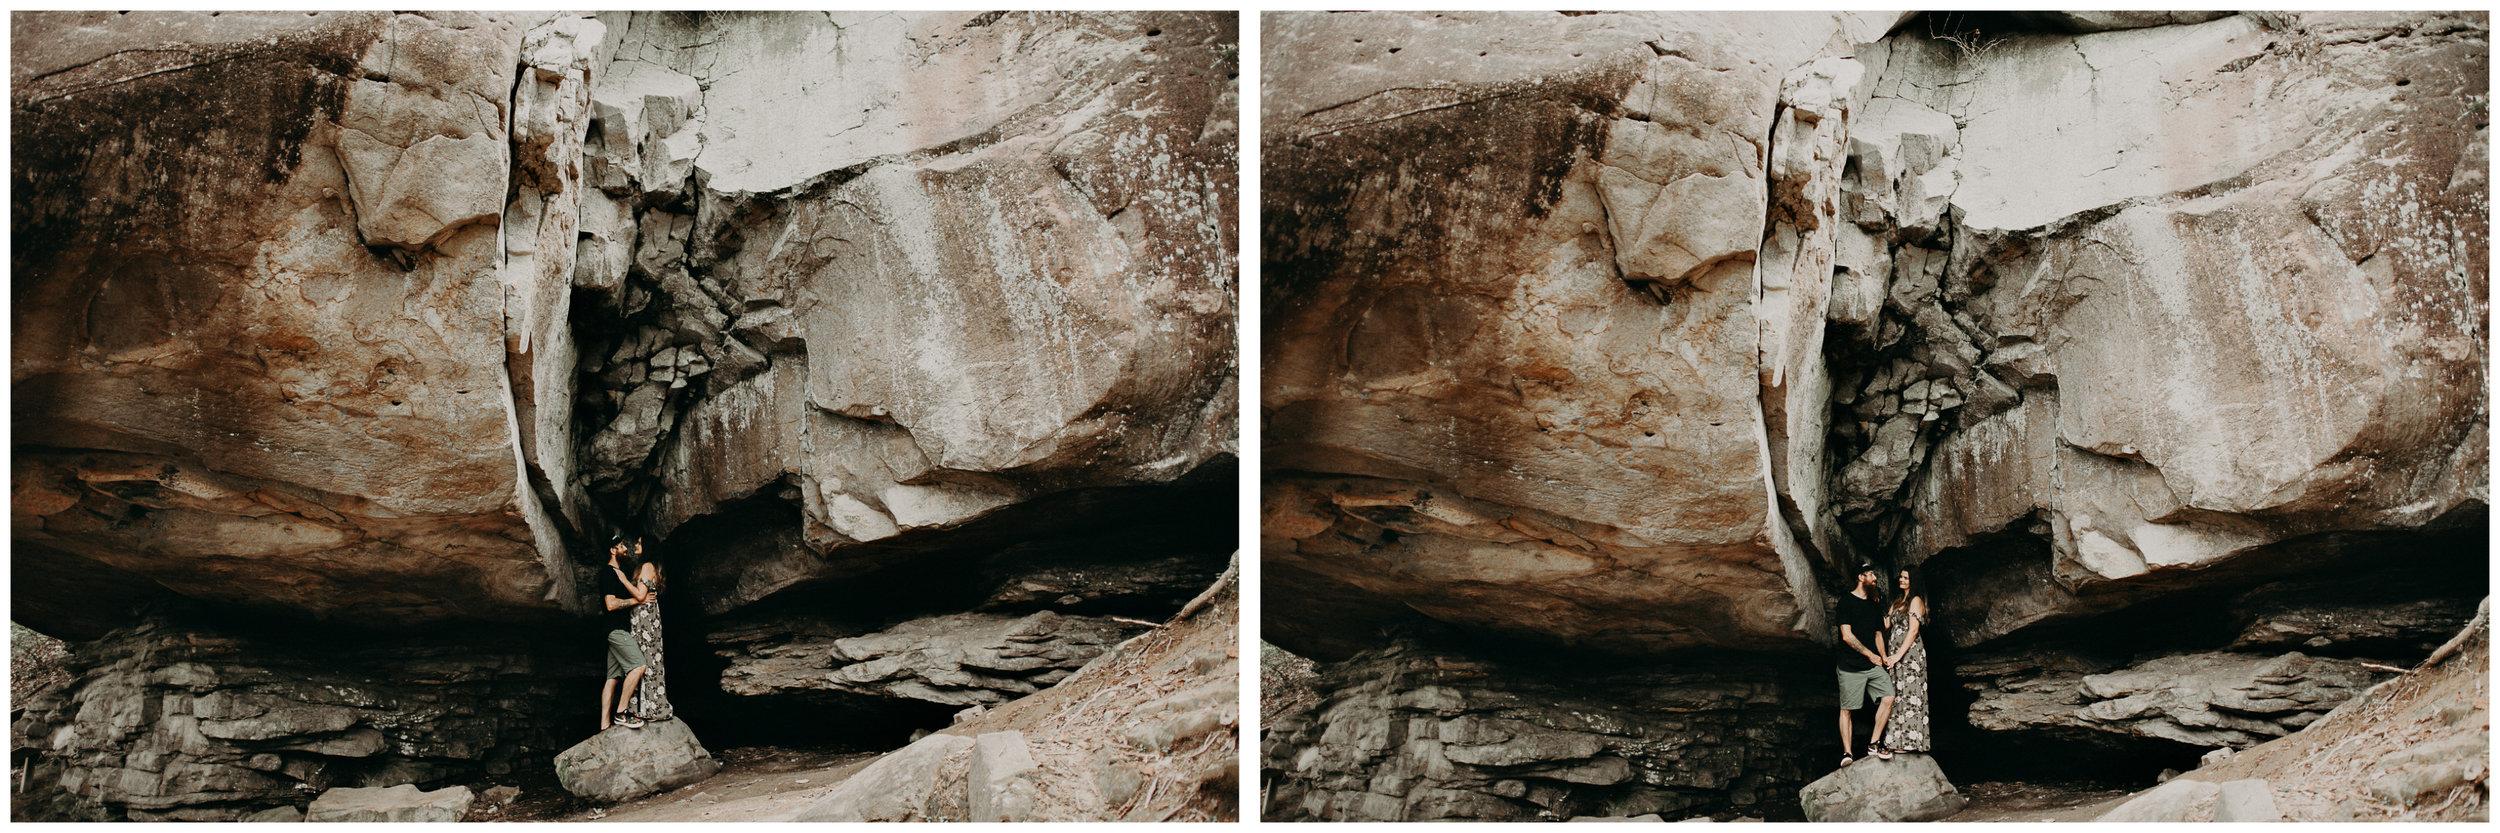 Cloudland canyon, whaterfall georgia, couples waterfall engagement 13.jpg